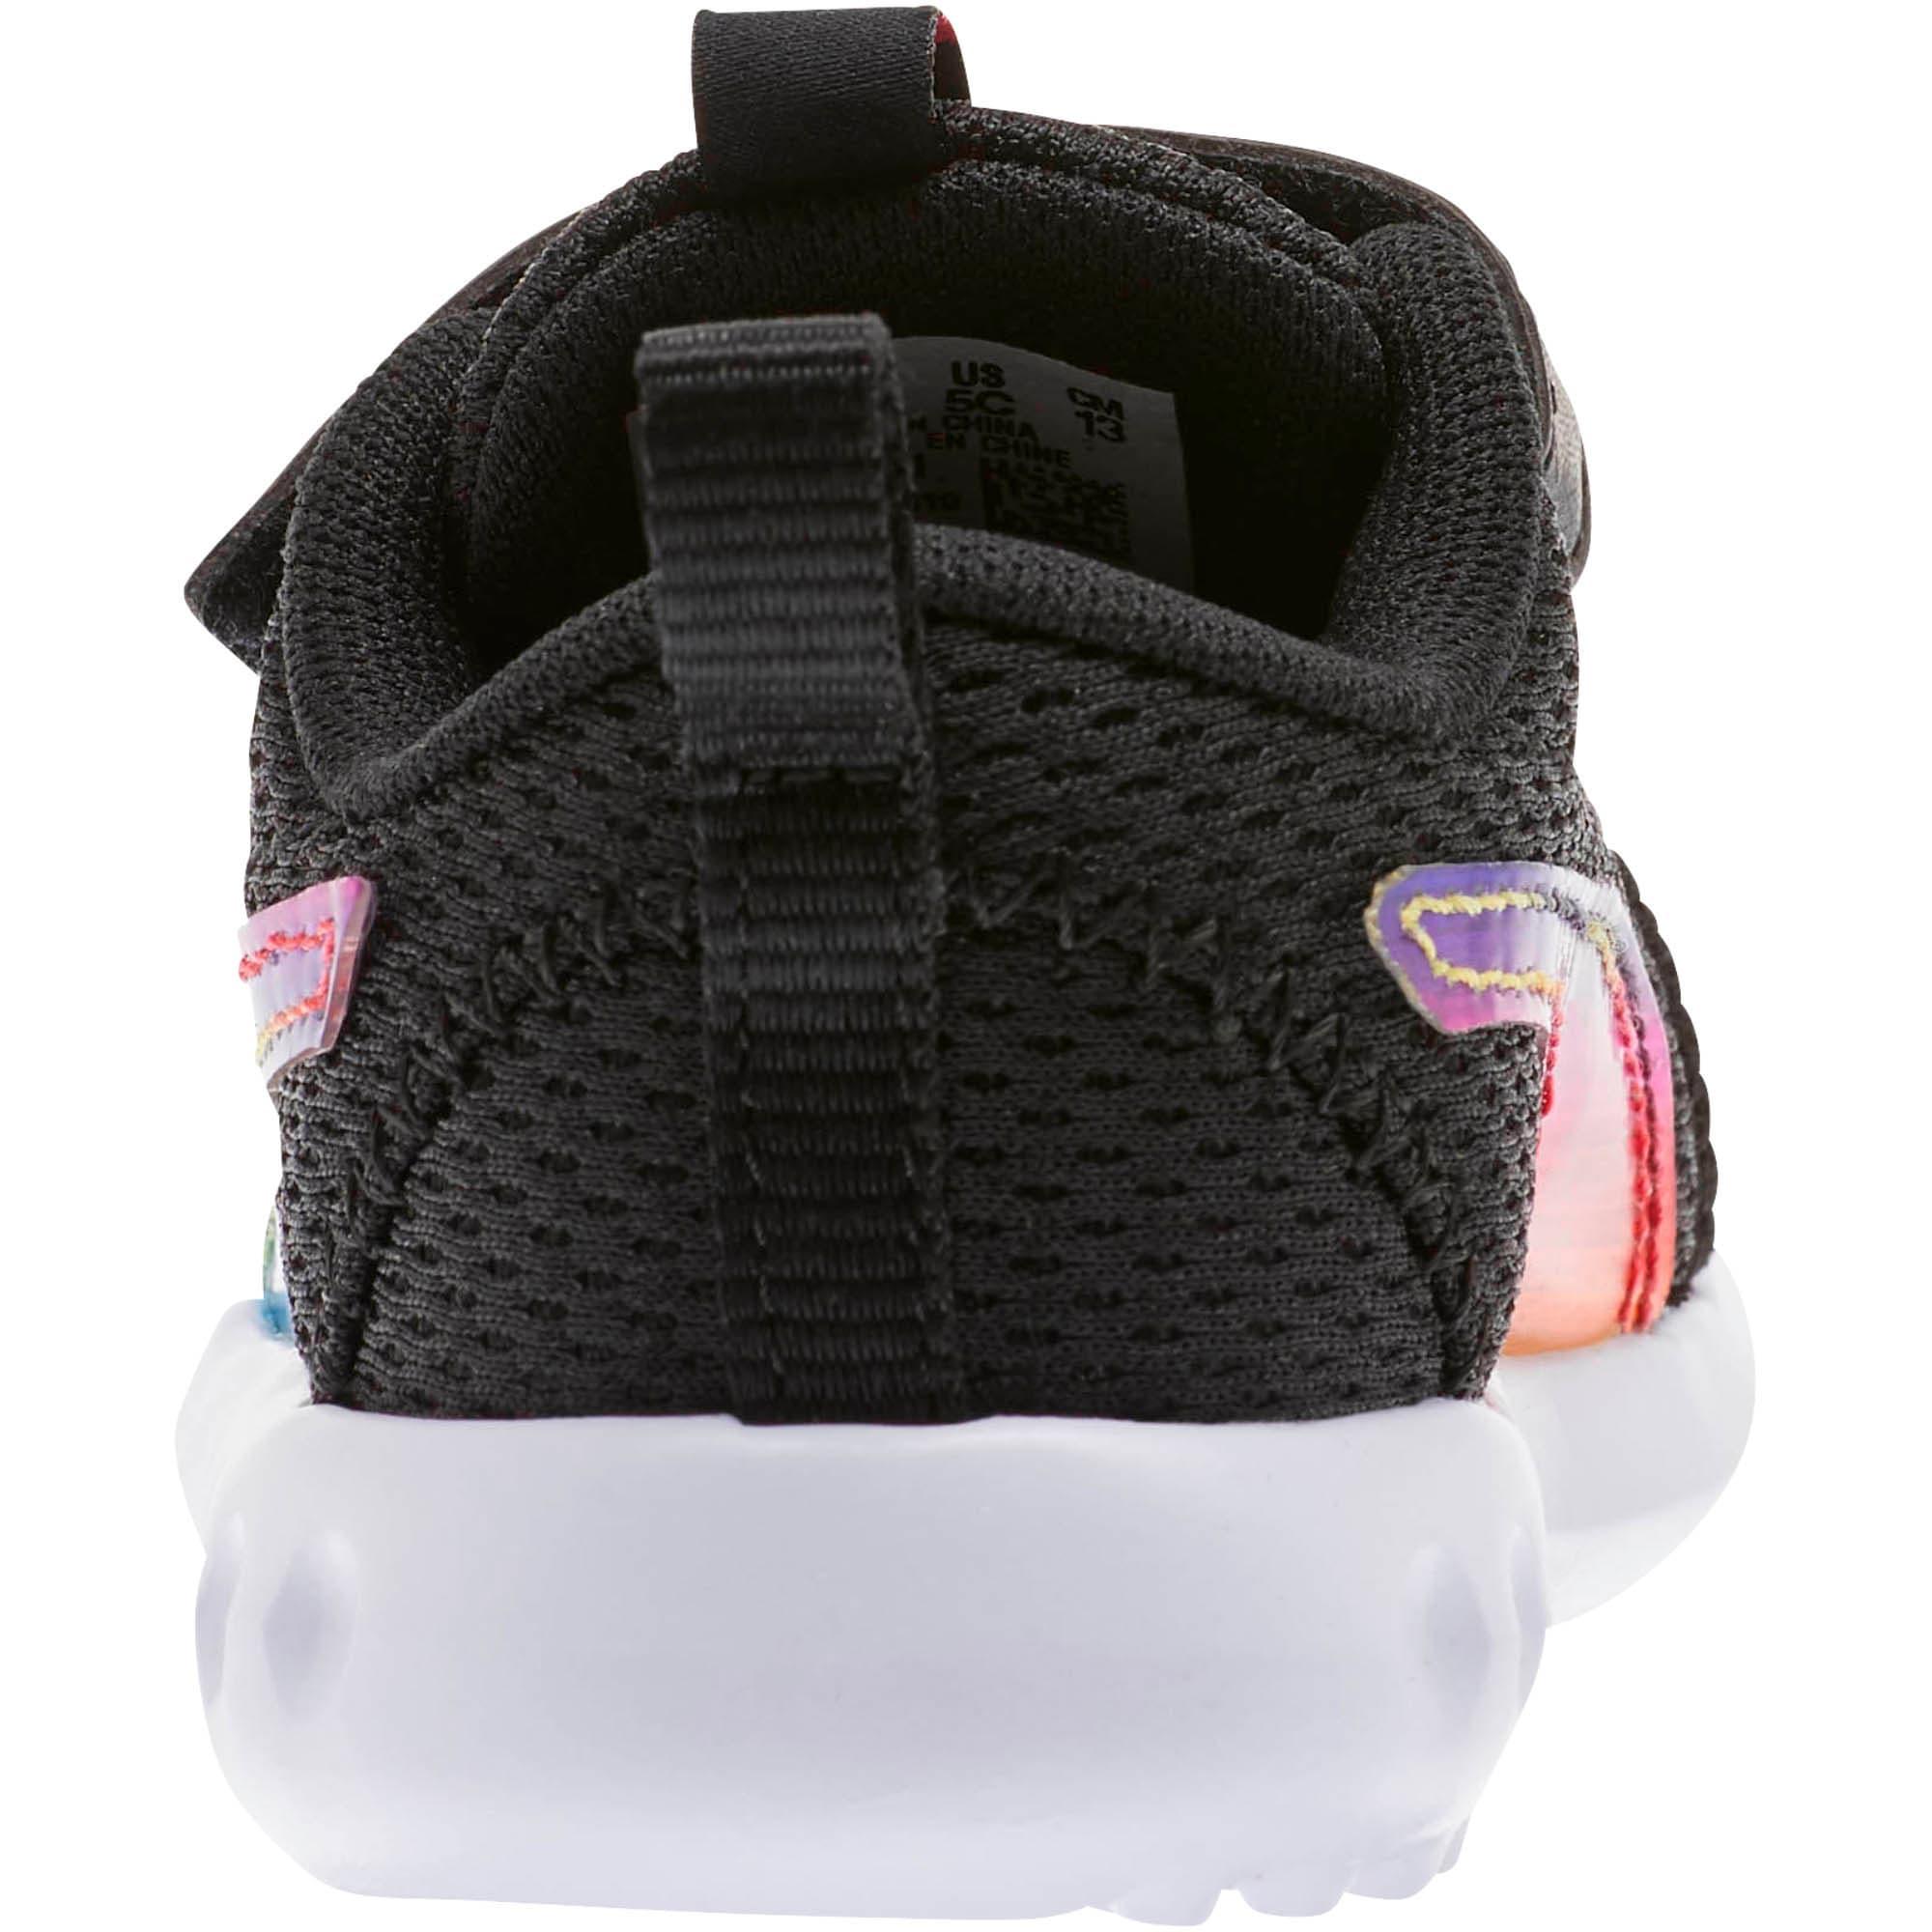 Thumbnail 3 of Carson 2 Iridescent Toddler Shoes, Puma Black-Puma White, medium